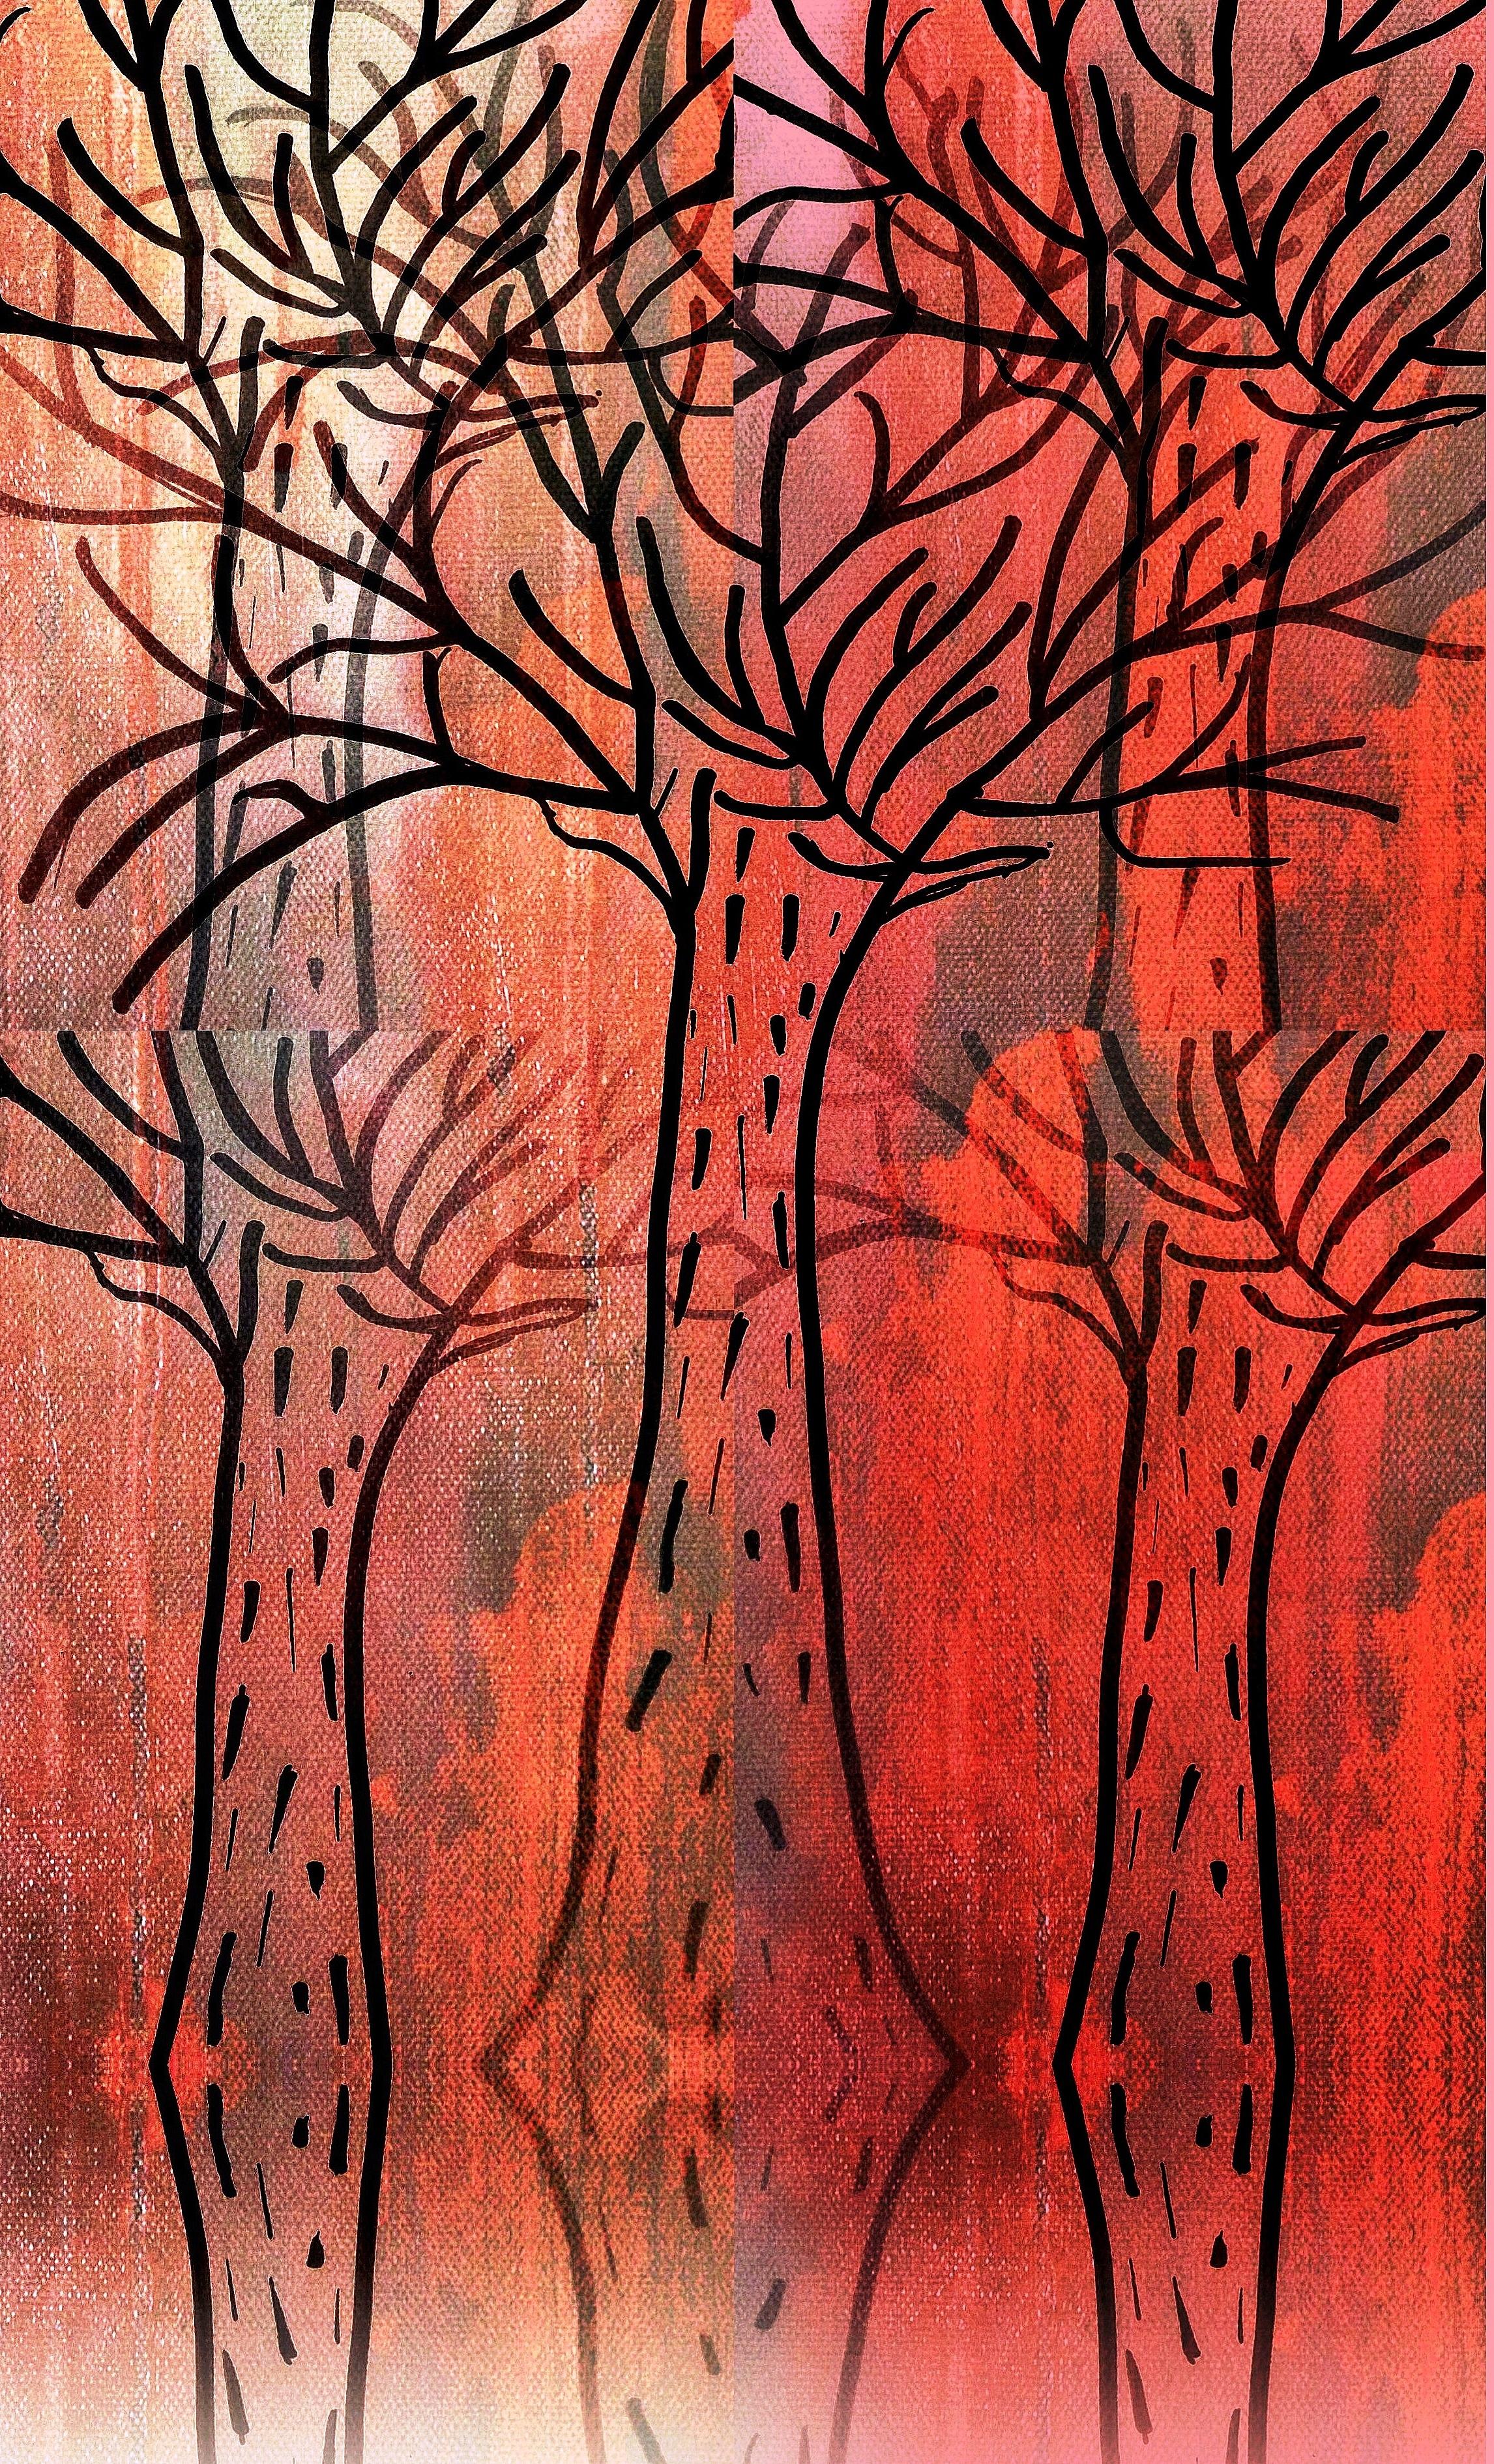 Gambar Hutan Cabang Abstrak Tekstur Pola Garis Merah Tumbuh